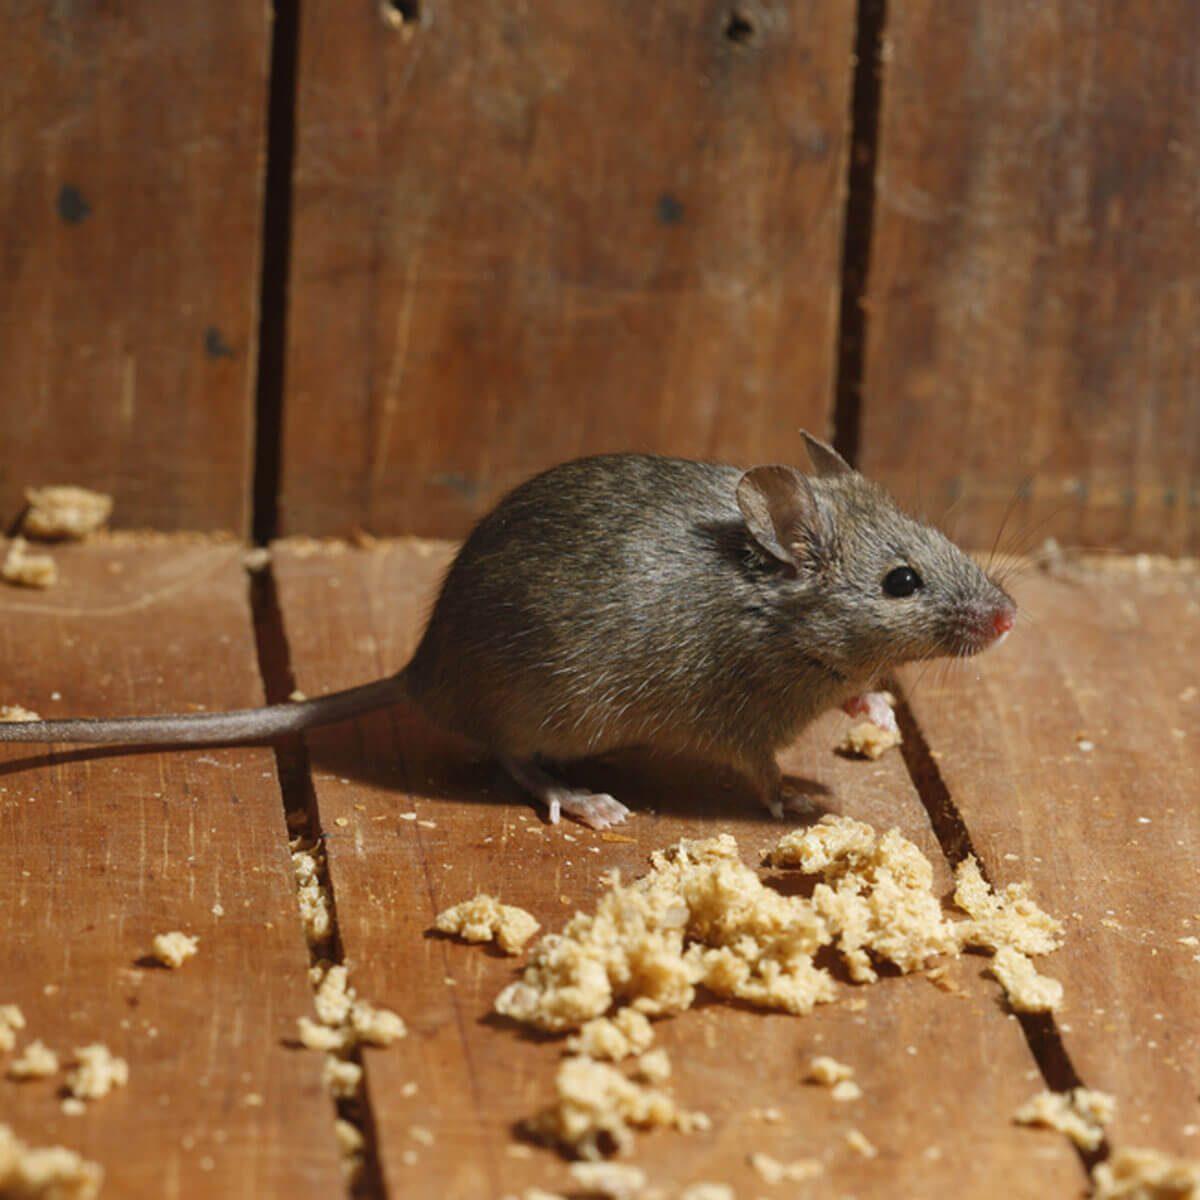 Discourage Pests